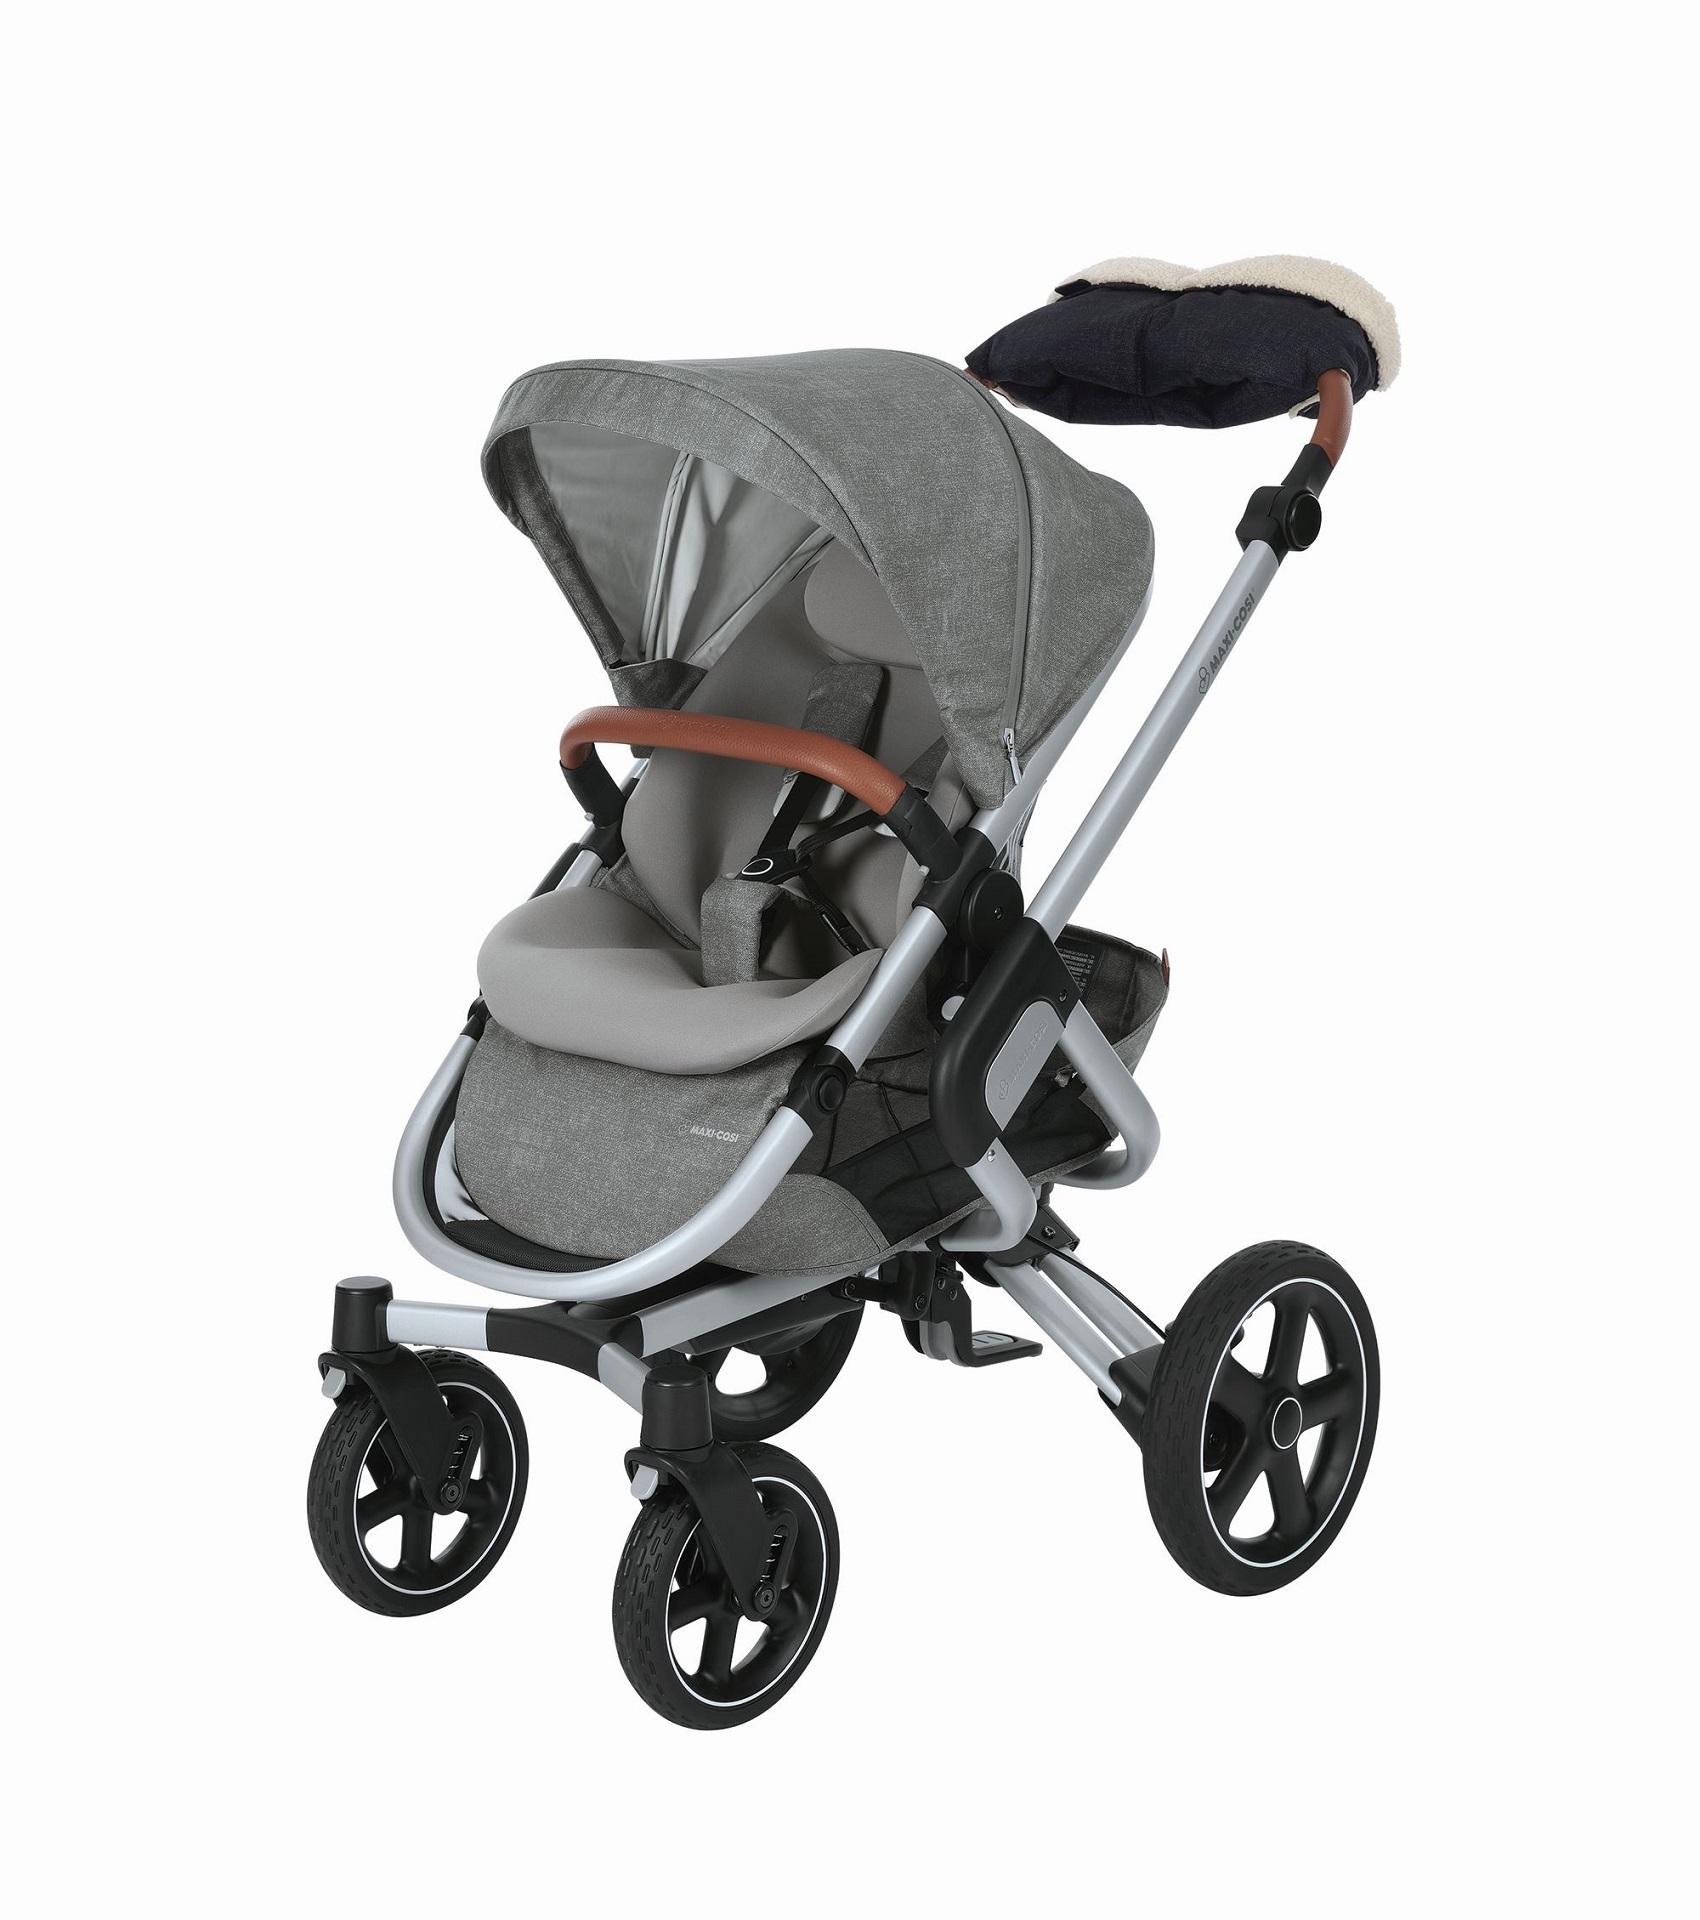 maxi cosi hand warmer buy at kidsroom strollers. Black Bedroom Furniture Sets. Home Design Ideas